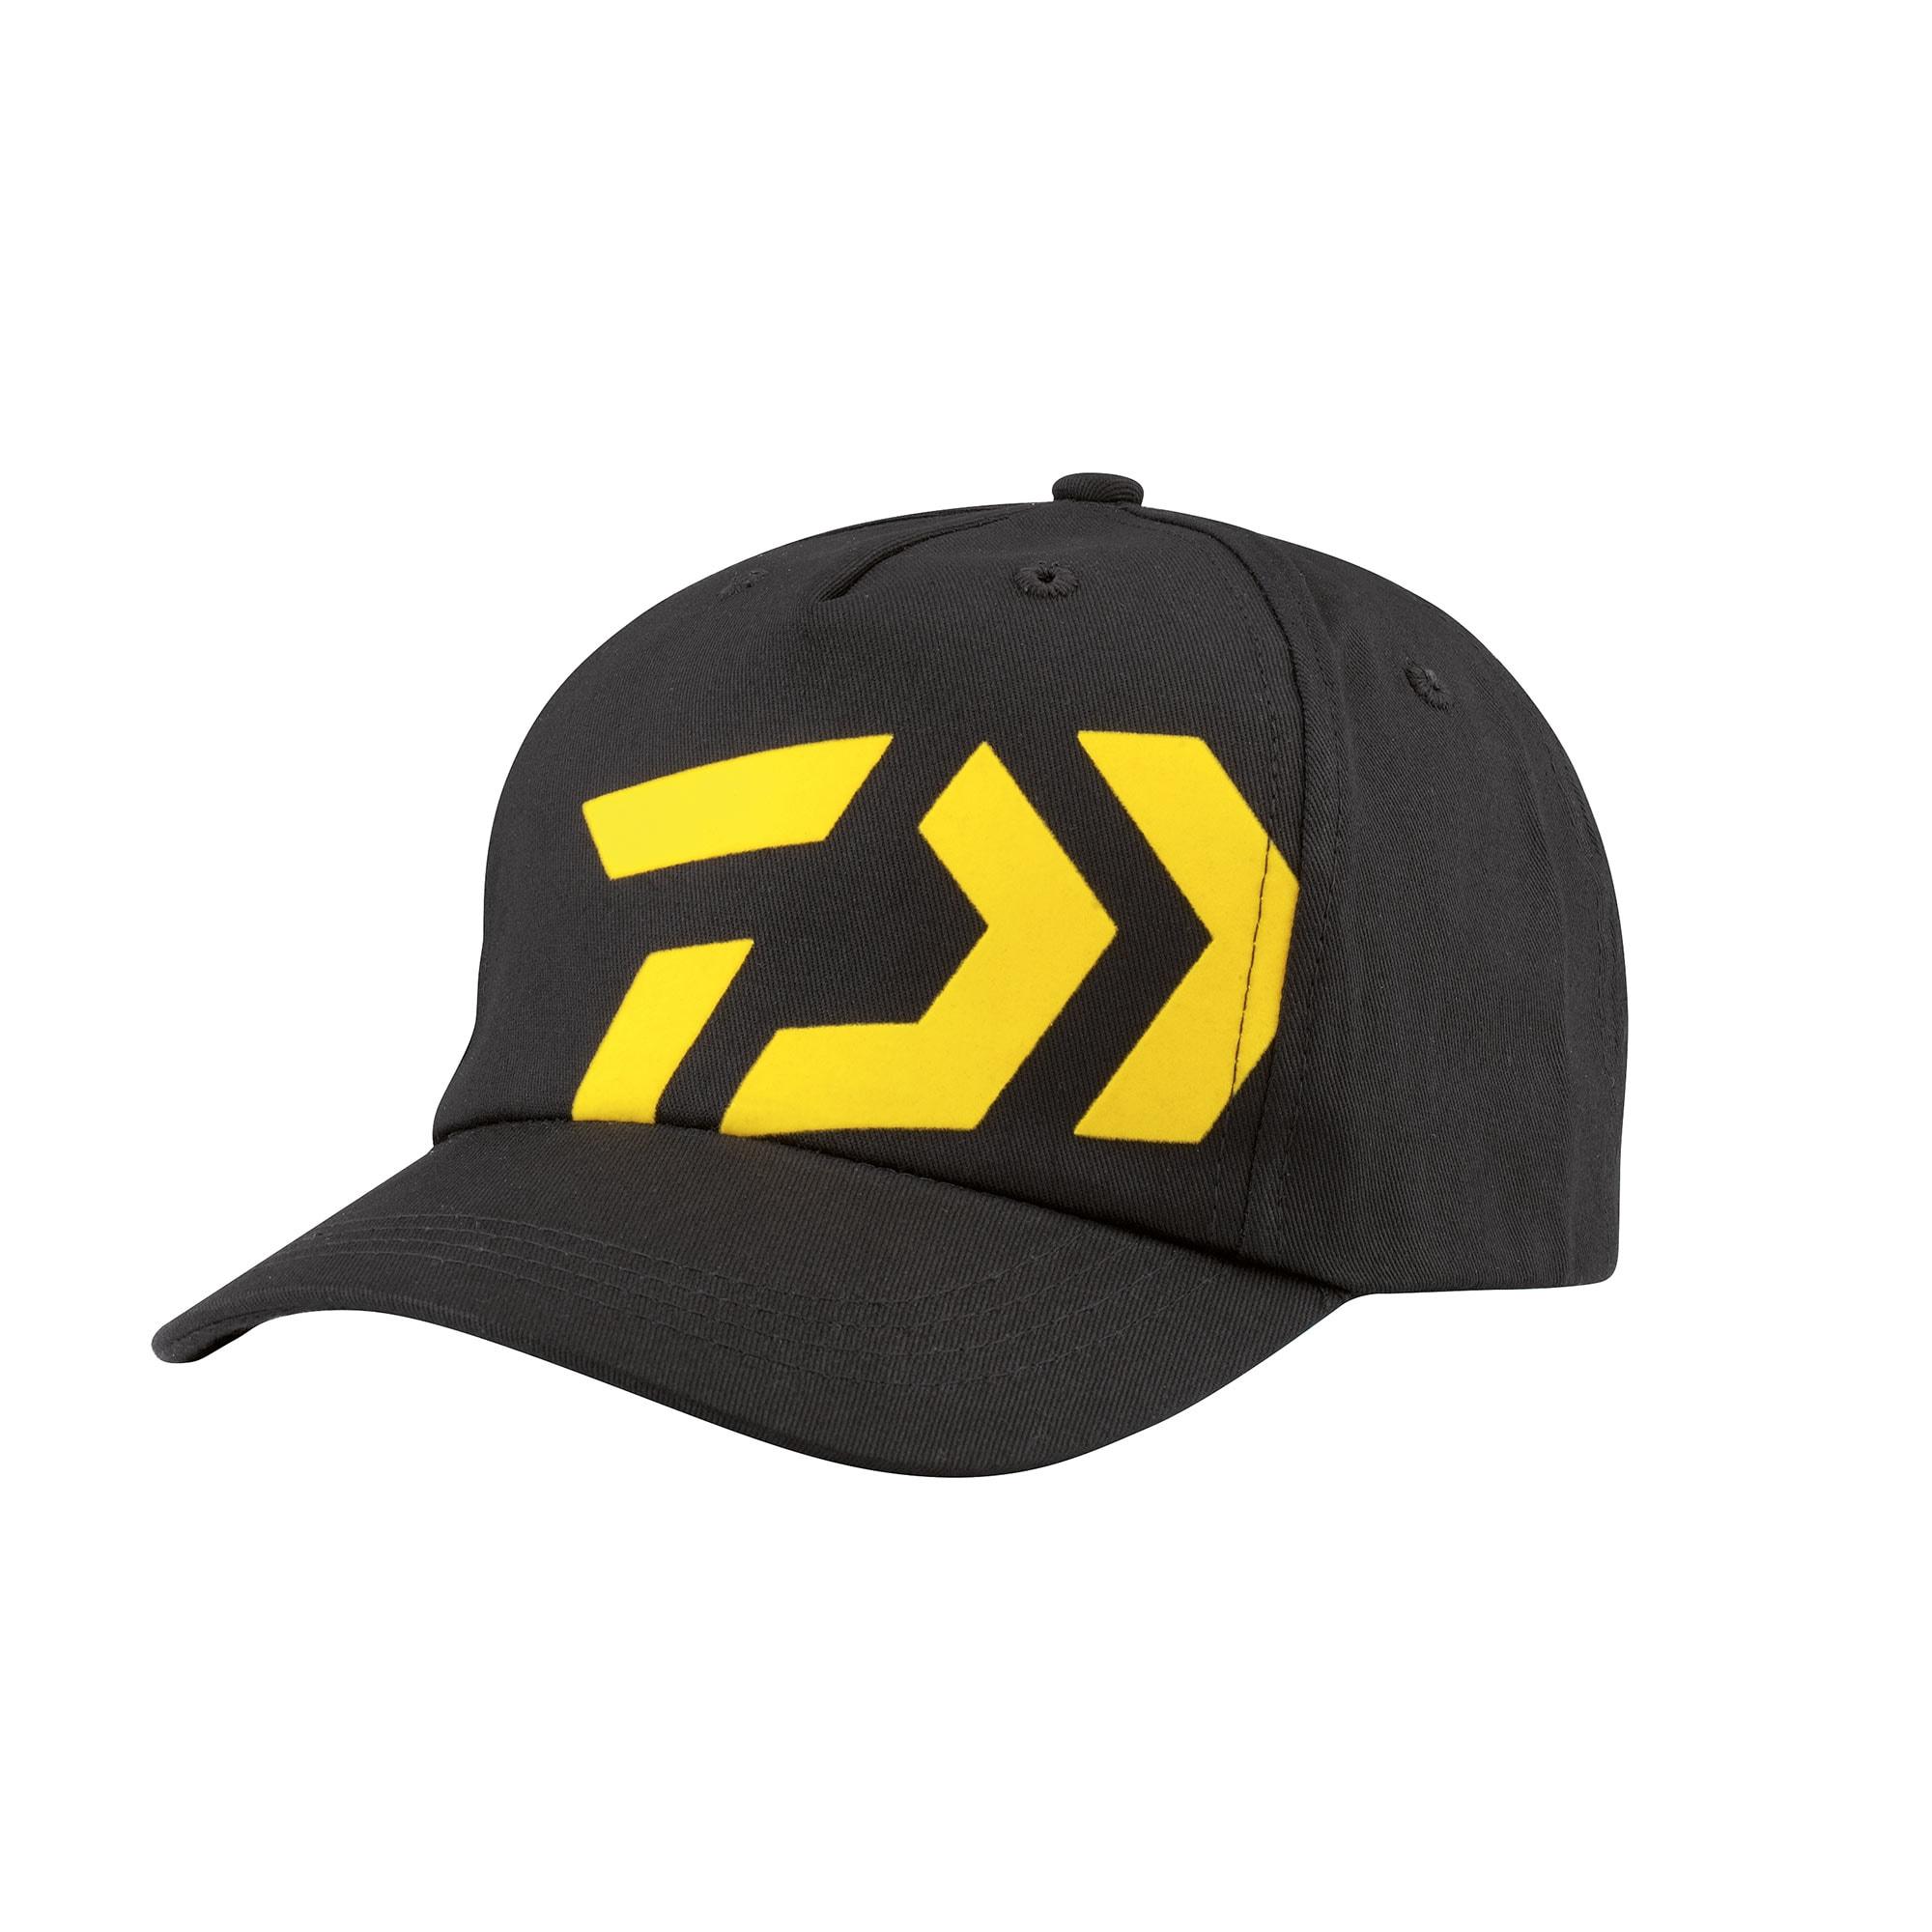 Cappellino black/yellow DAIWA